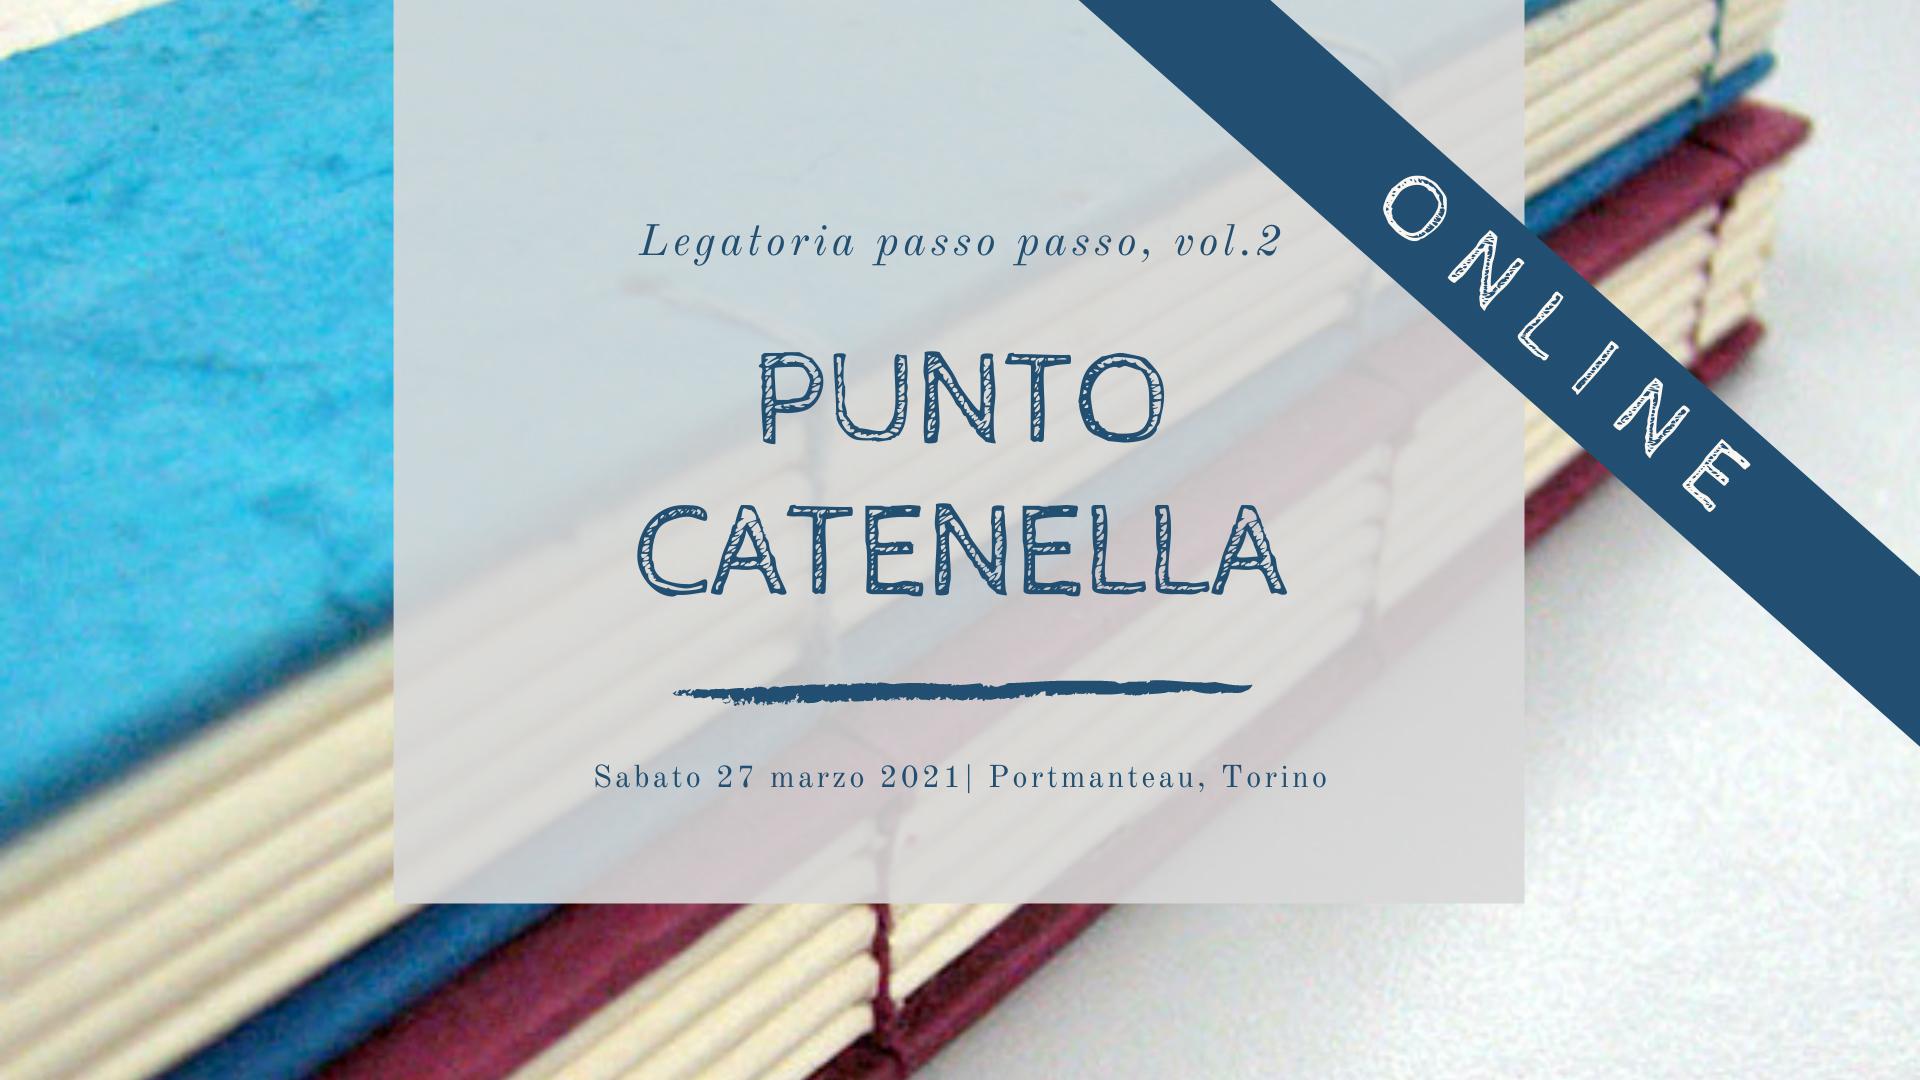 Workshop online legatoria copta